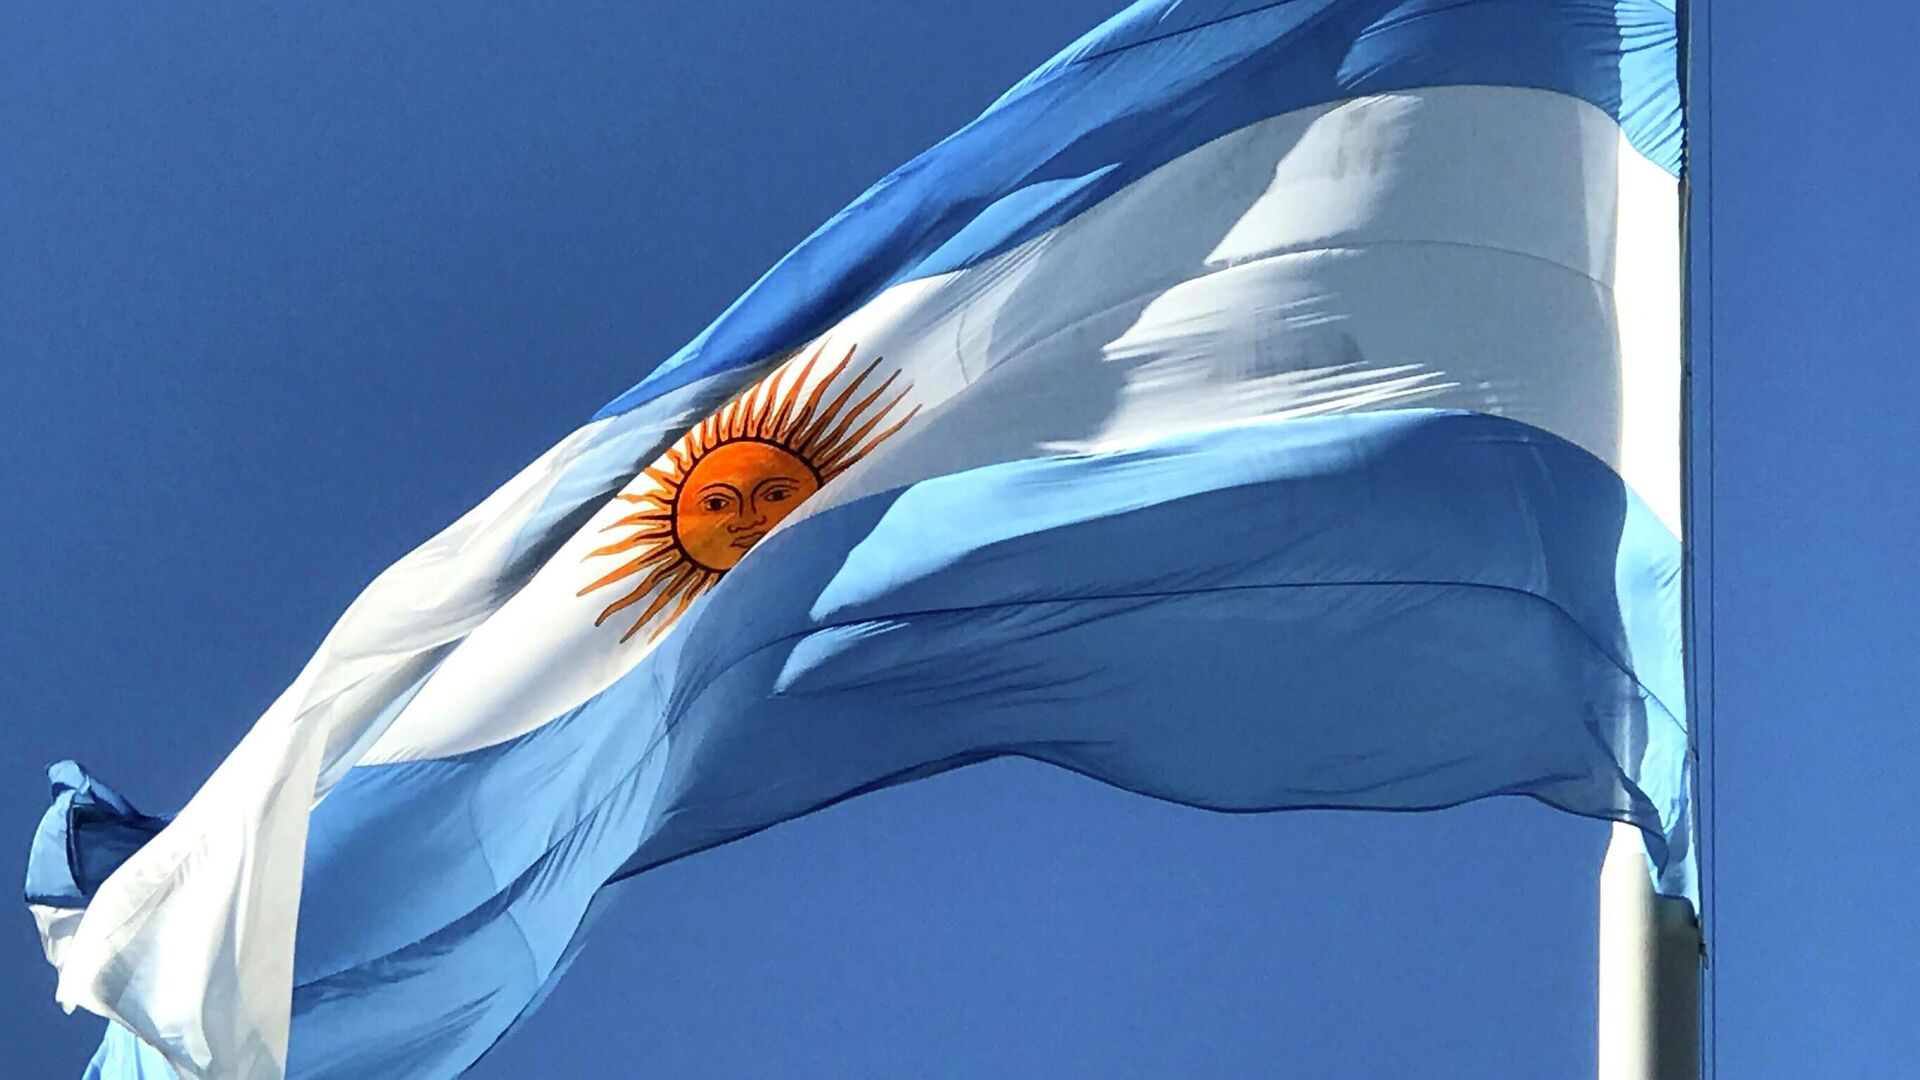 Bandera de Argentina - Sputnik Mundo, 1920, 31.05.2021